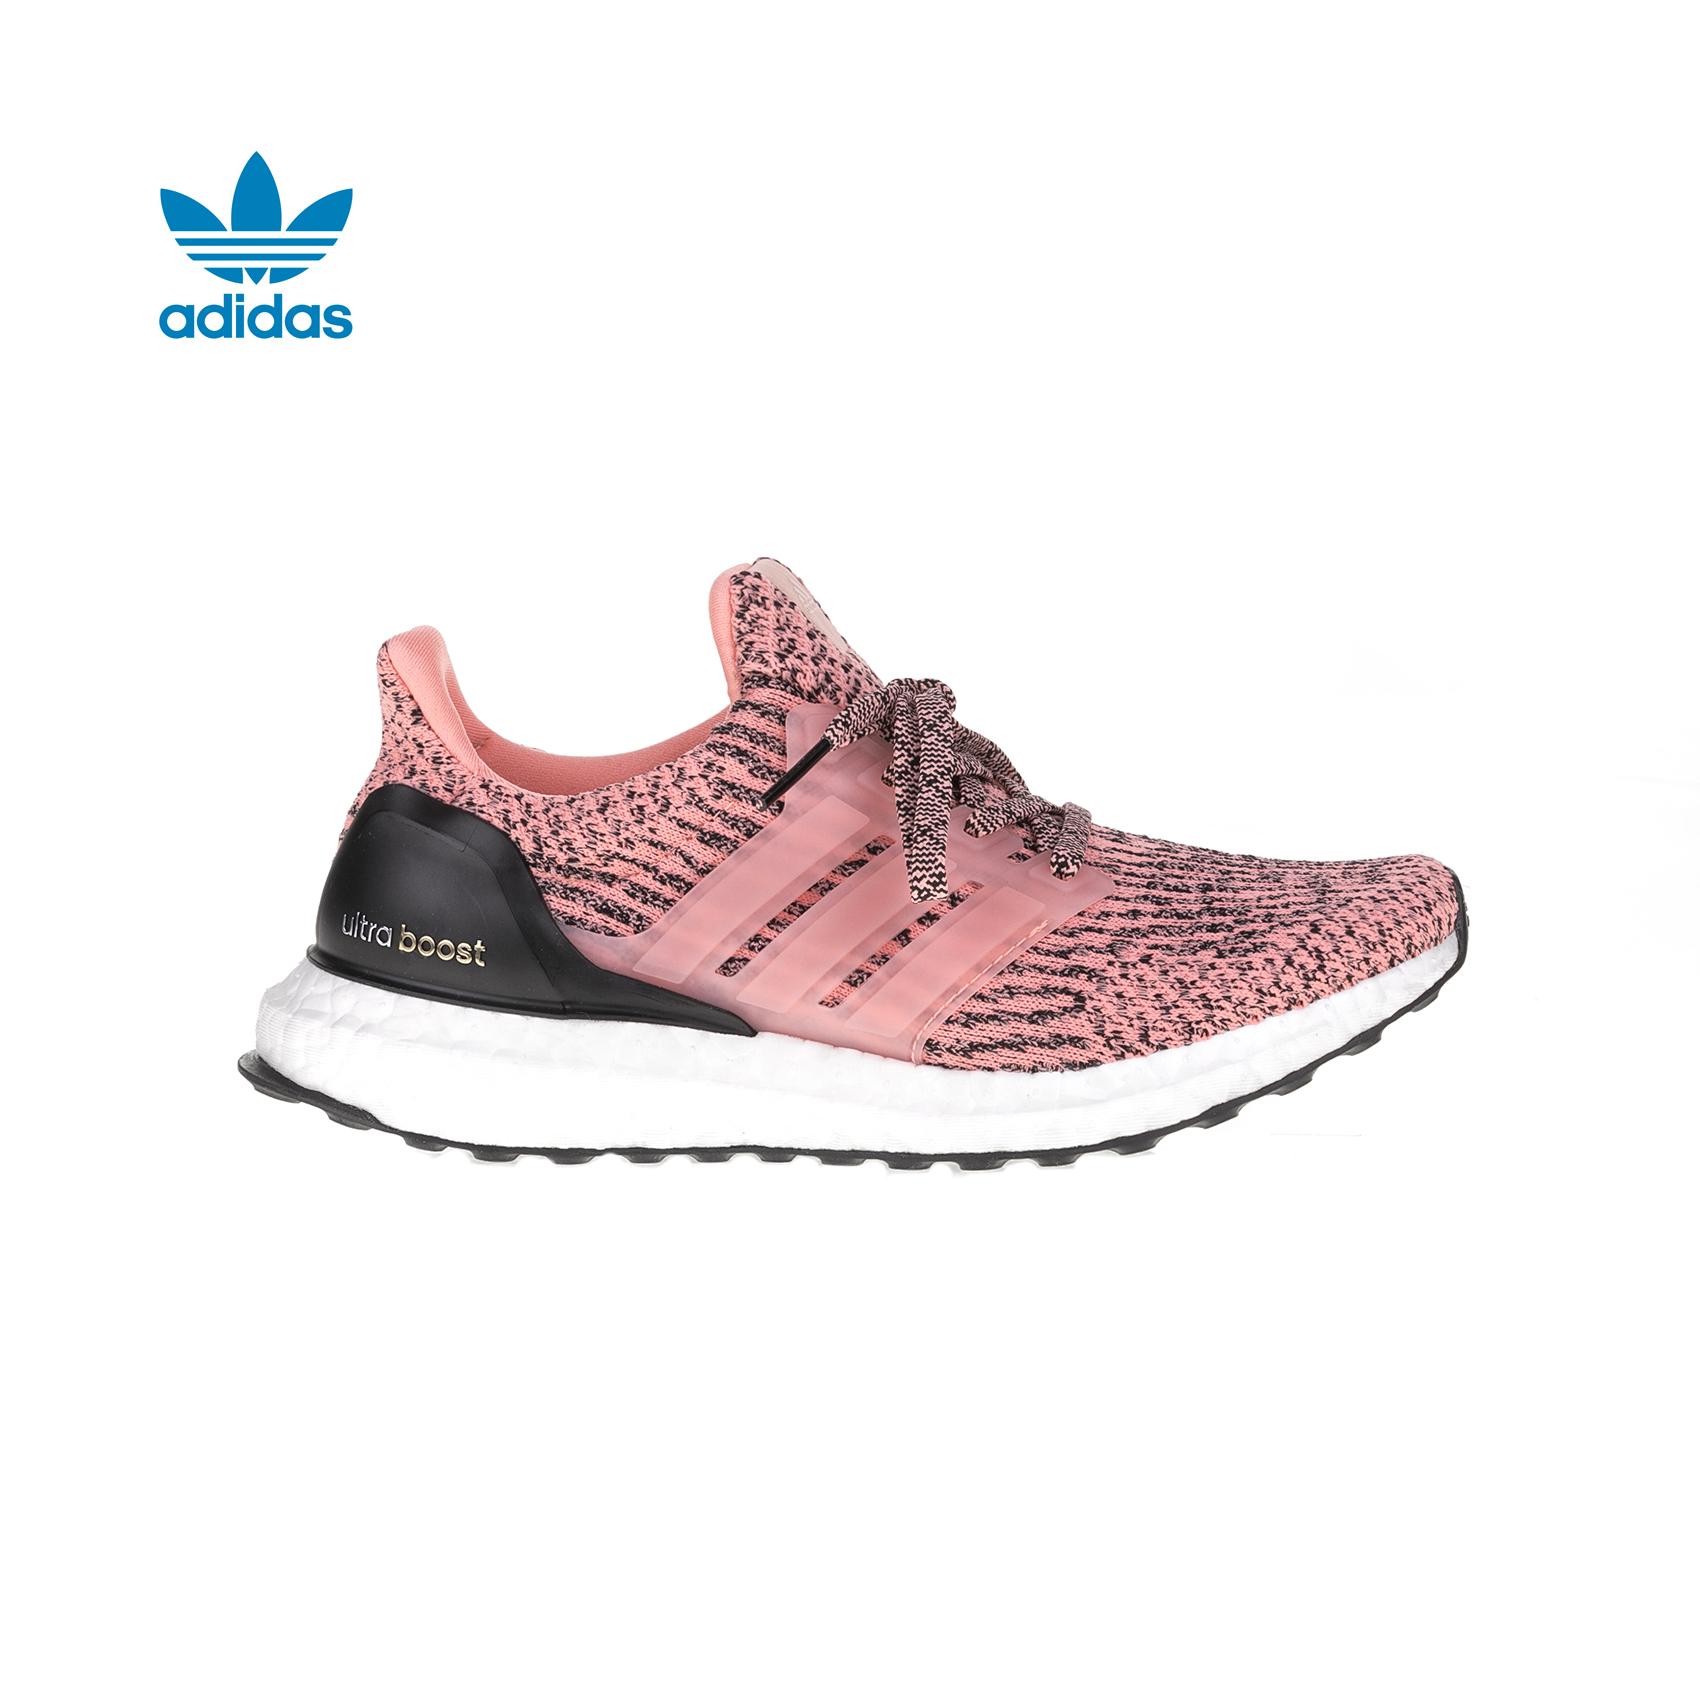 adidas Originals – Γυναικεία παπούτσια adidas UltraBOOST ροζ